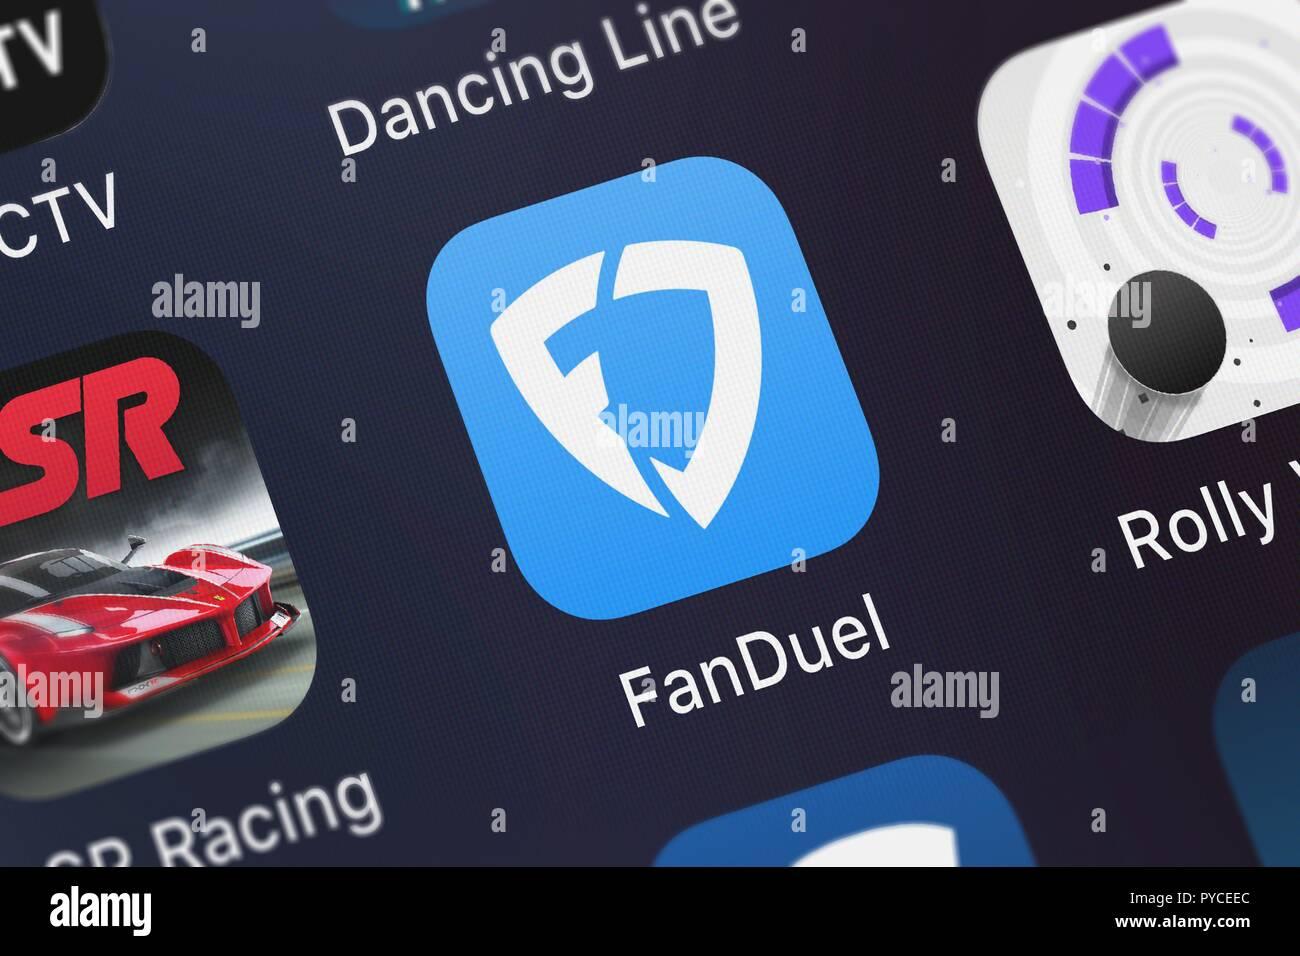 Londres, Royaume-Uni - 26 octobre 2018: Capture d'écran de l'application mobile - FanDuel FanDuel de Fantasy Football, Inc.. Banque D'Images